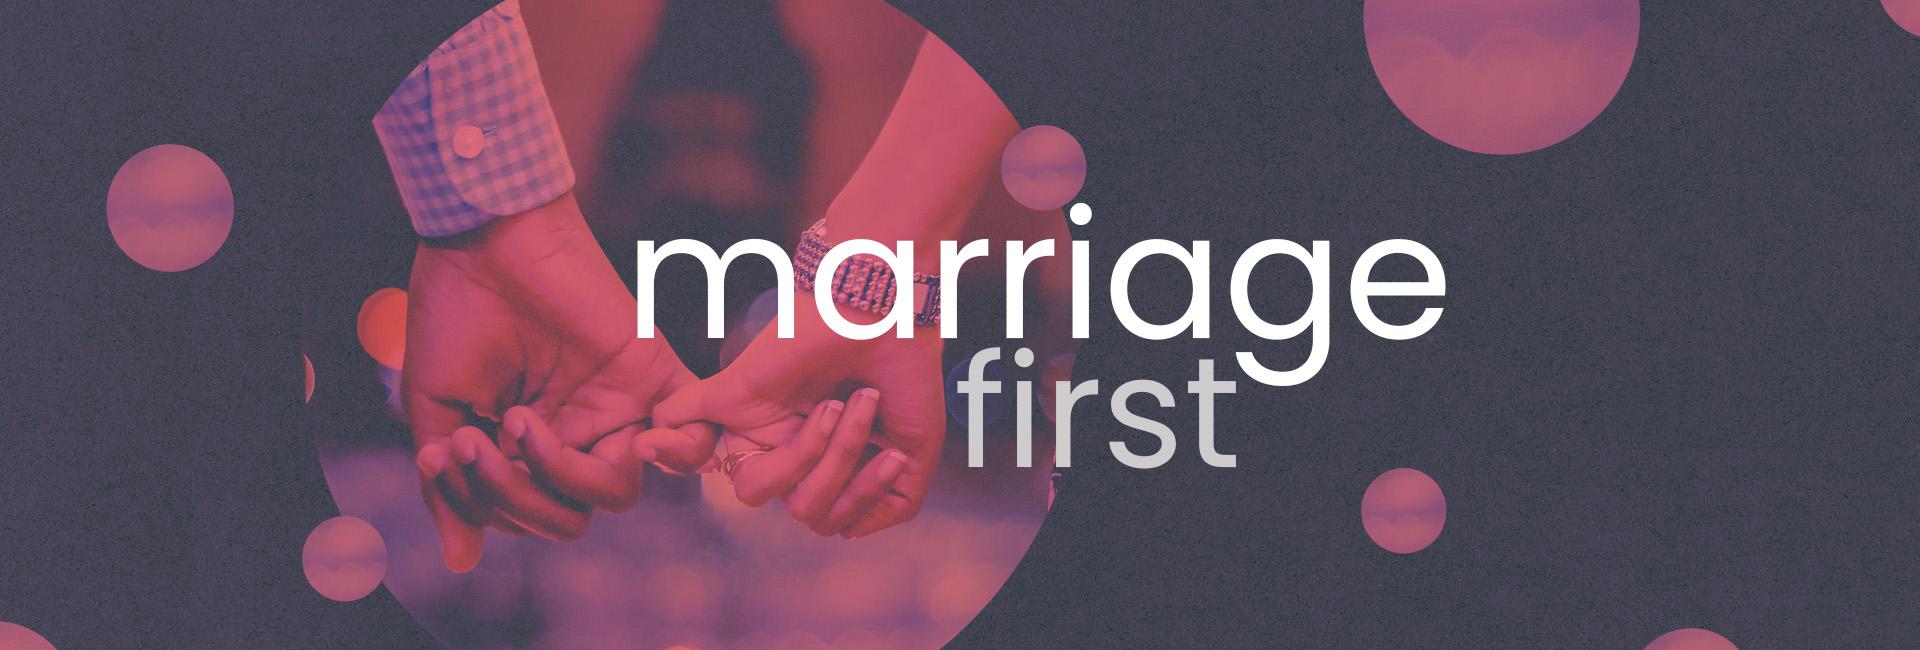 marriage first header